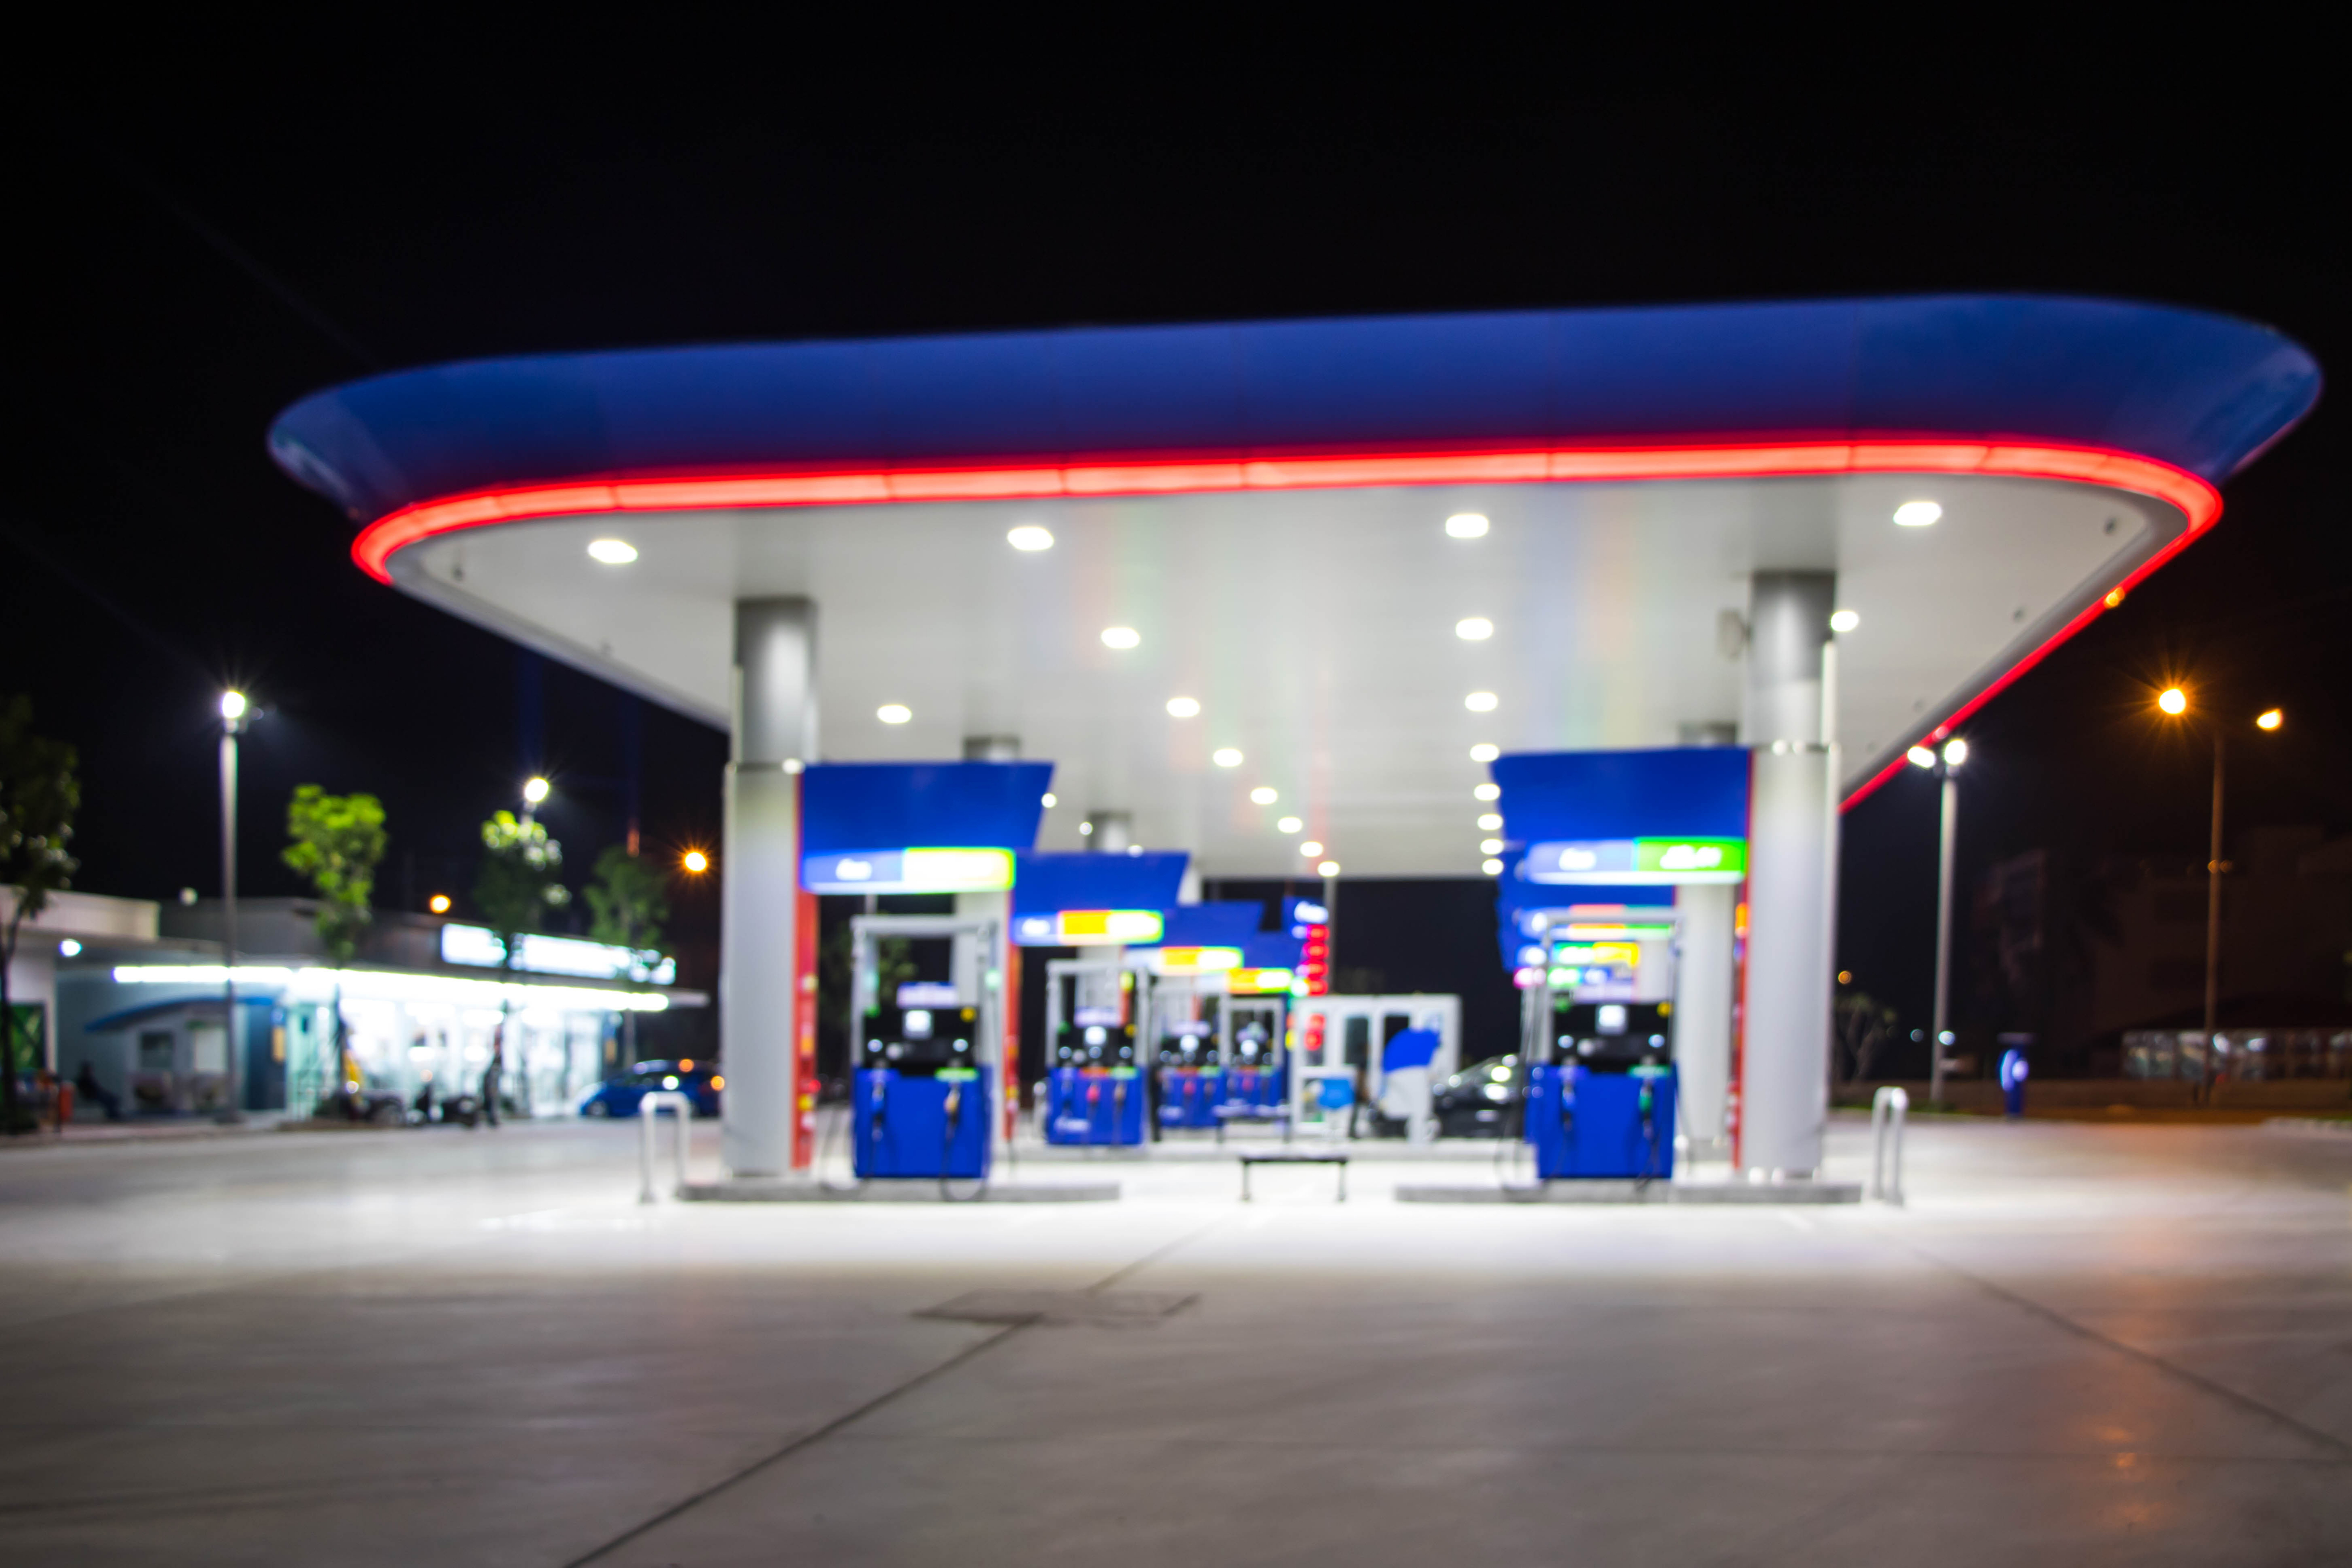 Tankstelle_CONTENT_srattha nualsate_Shutterstock.jpg